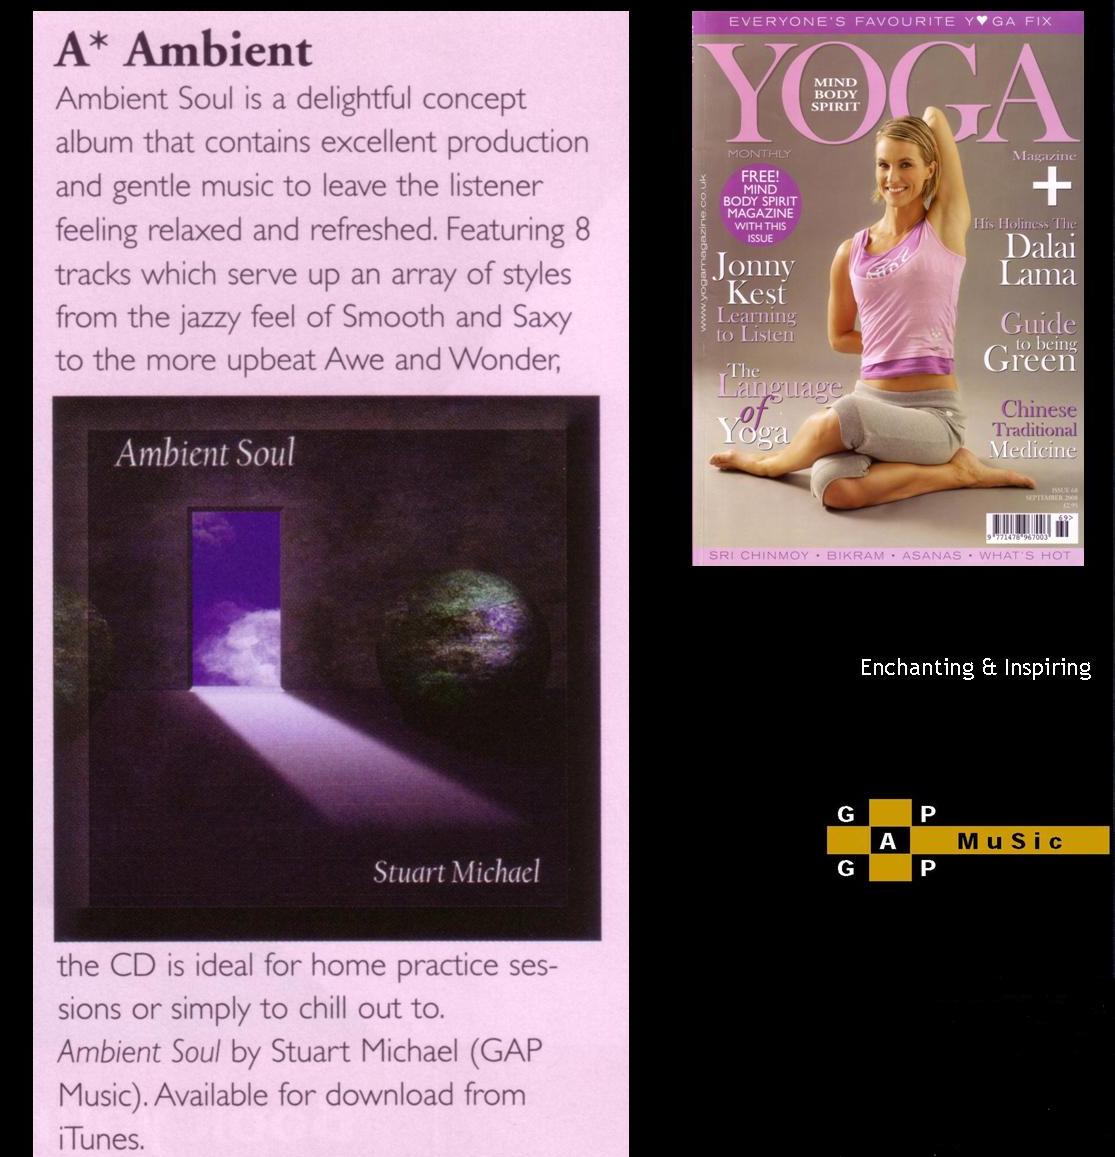 Ambient Soul - Yoga Magazine